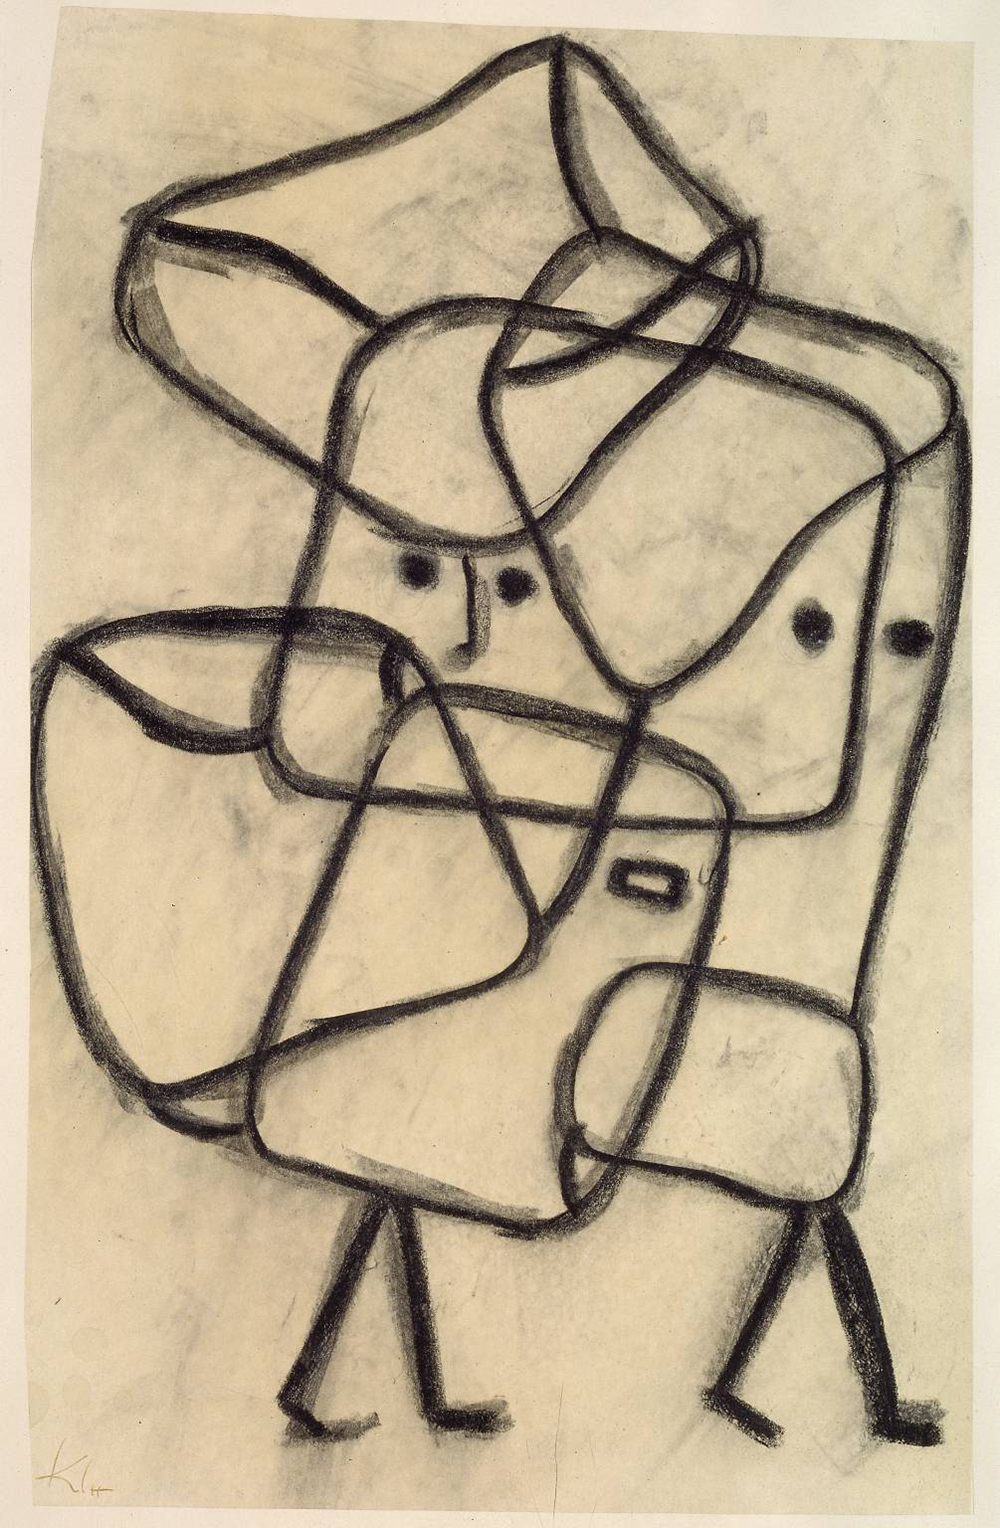 Burdened Children, by Paul Klee, 1930.